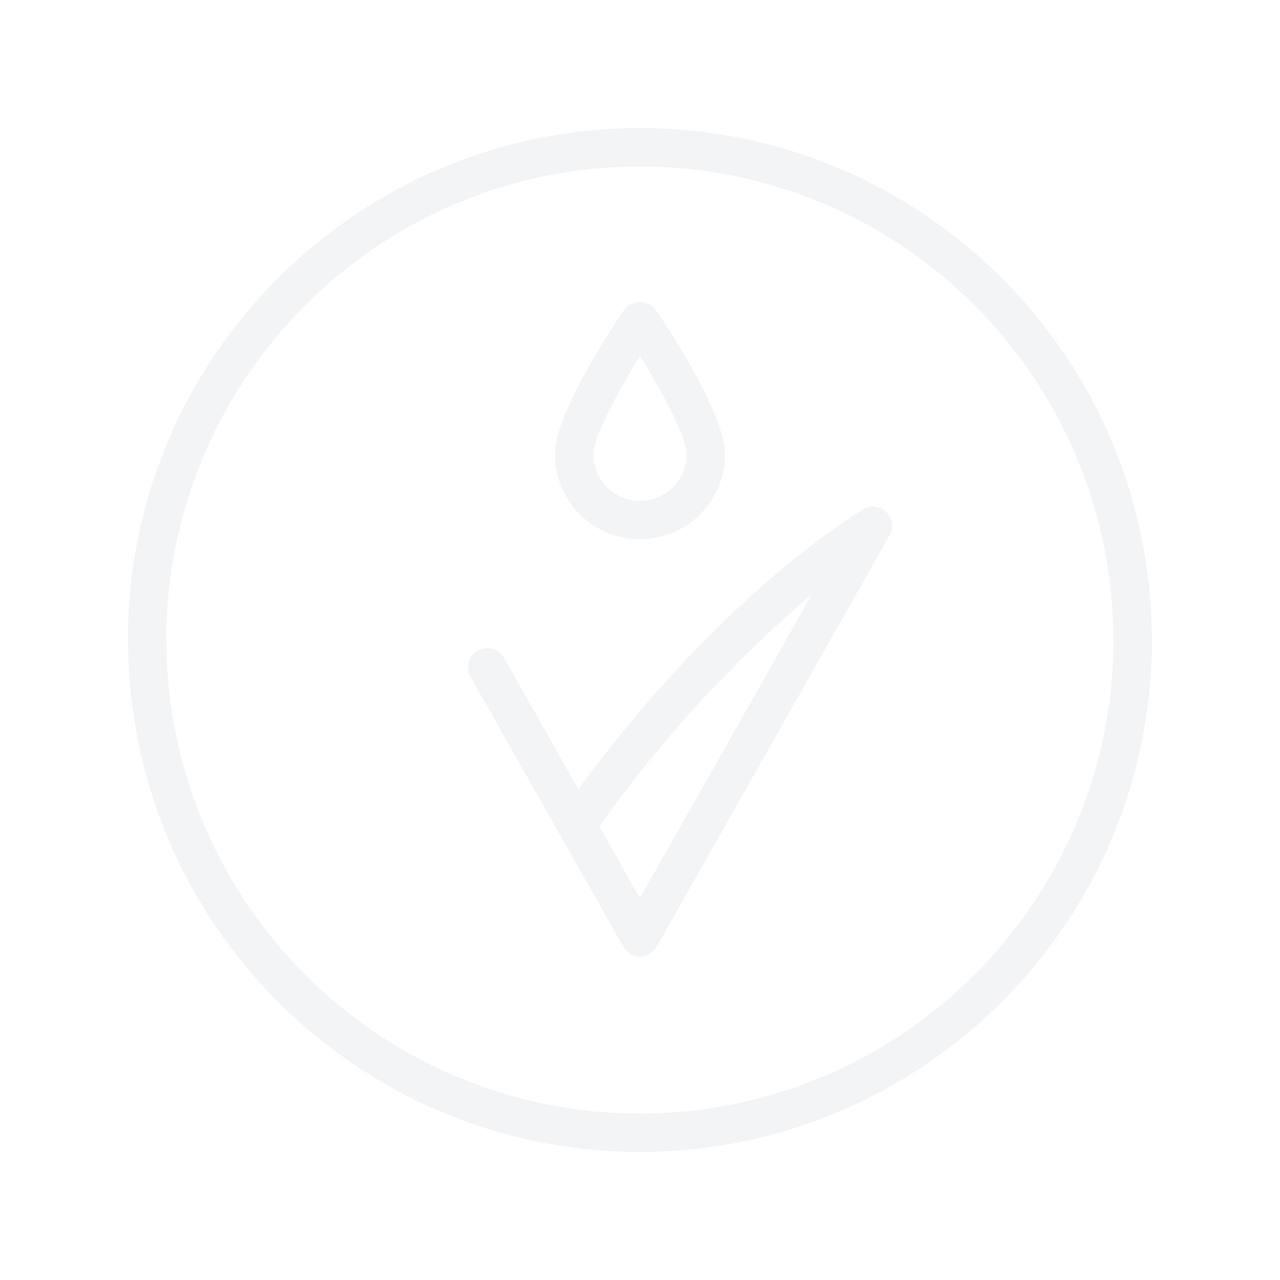 L'ANZA Keratin Healing Oil Lustrous Finishing Spray лак-блеск с кератиновым эликсиром